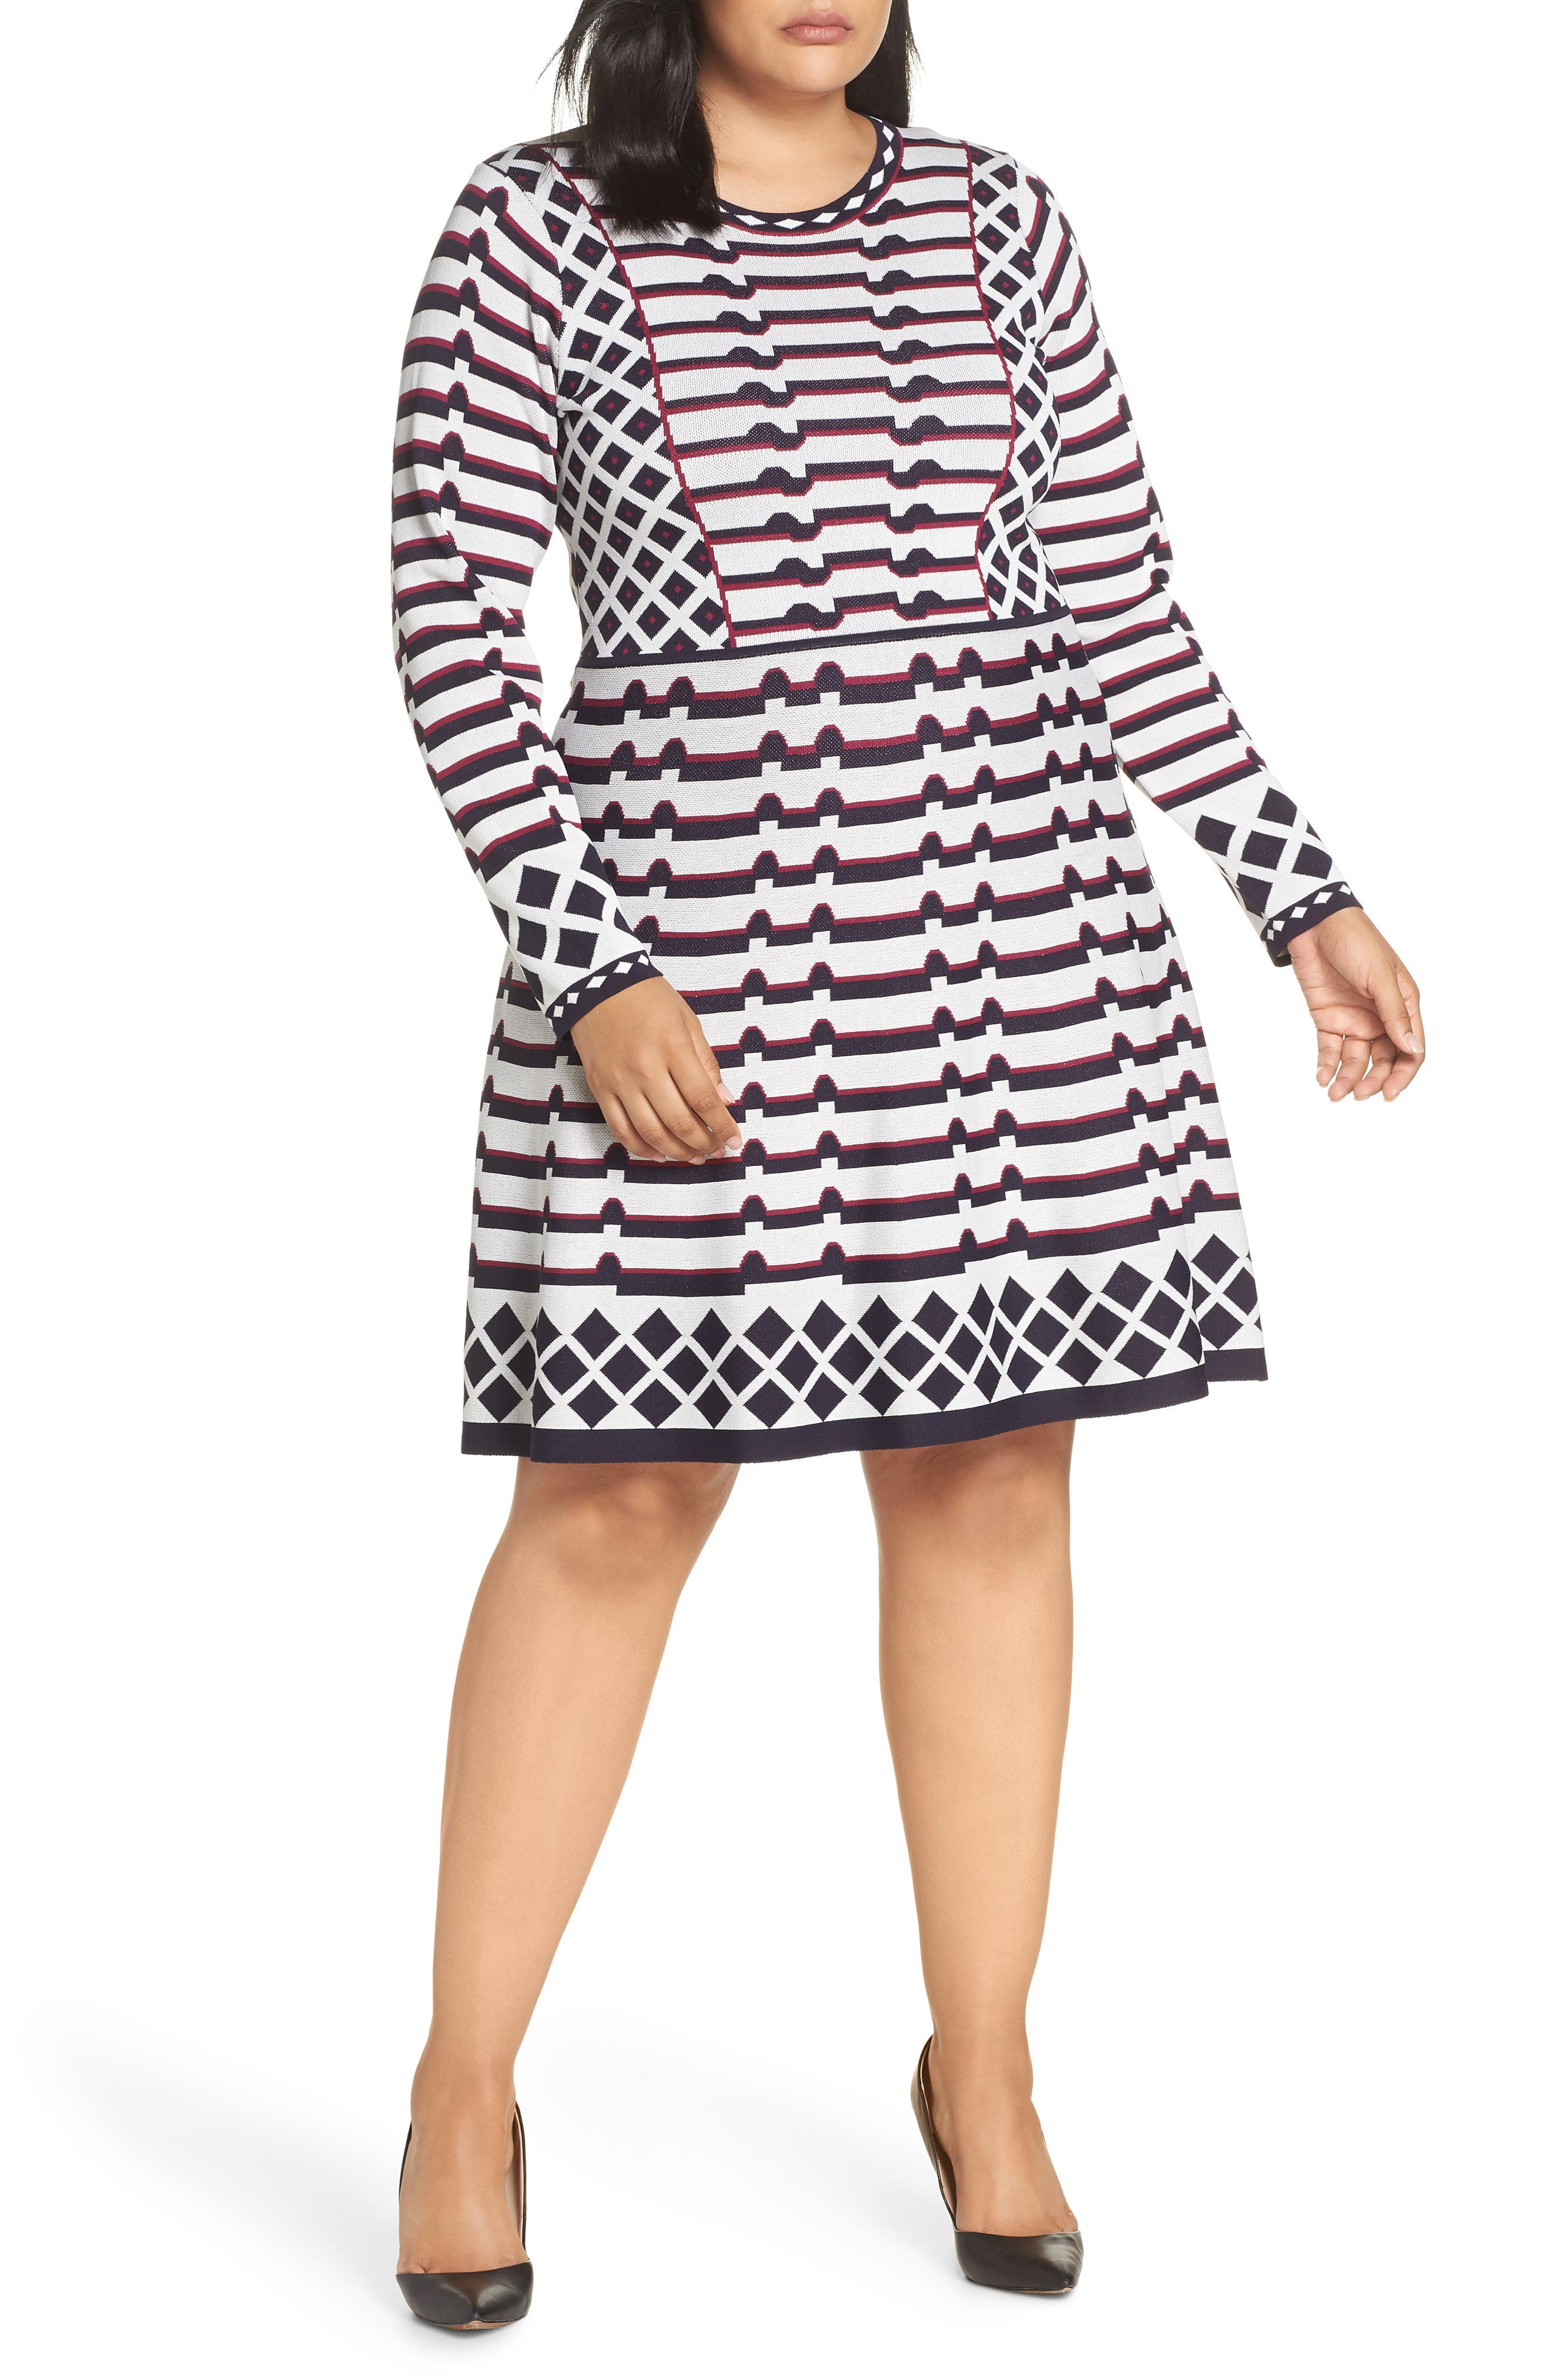 Plus Size Eliza J Artwork Jacquard Sweater Dress